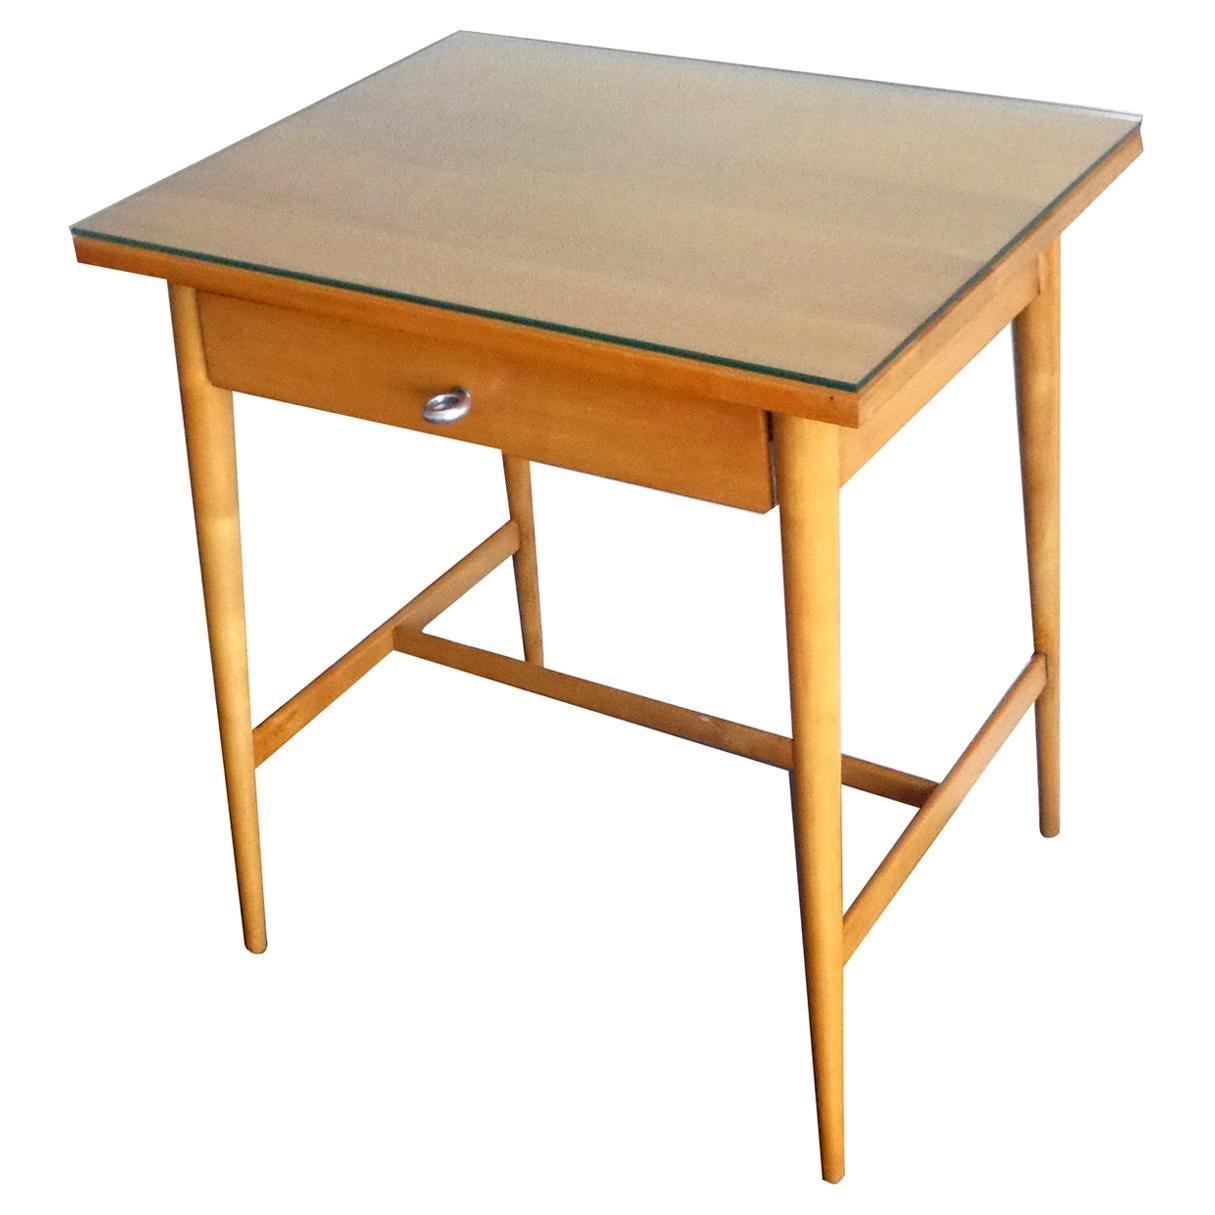 1 Paul McCobb Planner Group Side/Lamp Table #1586